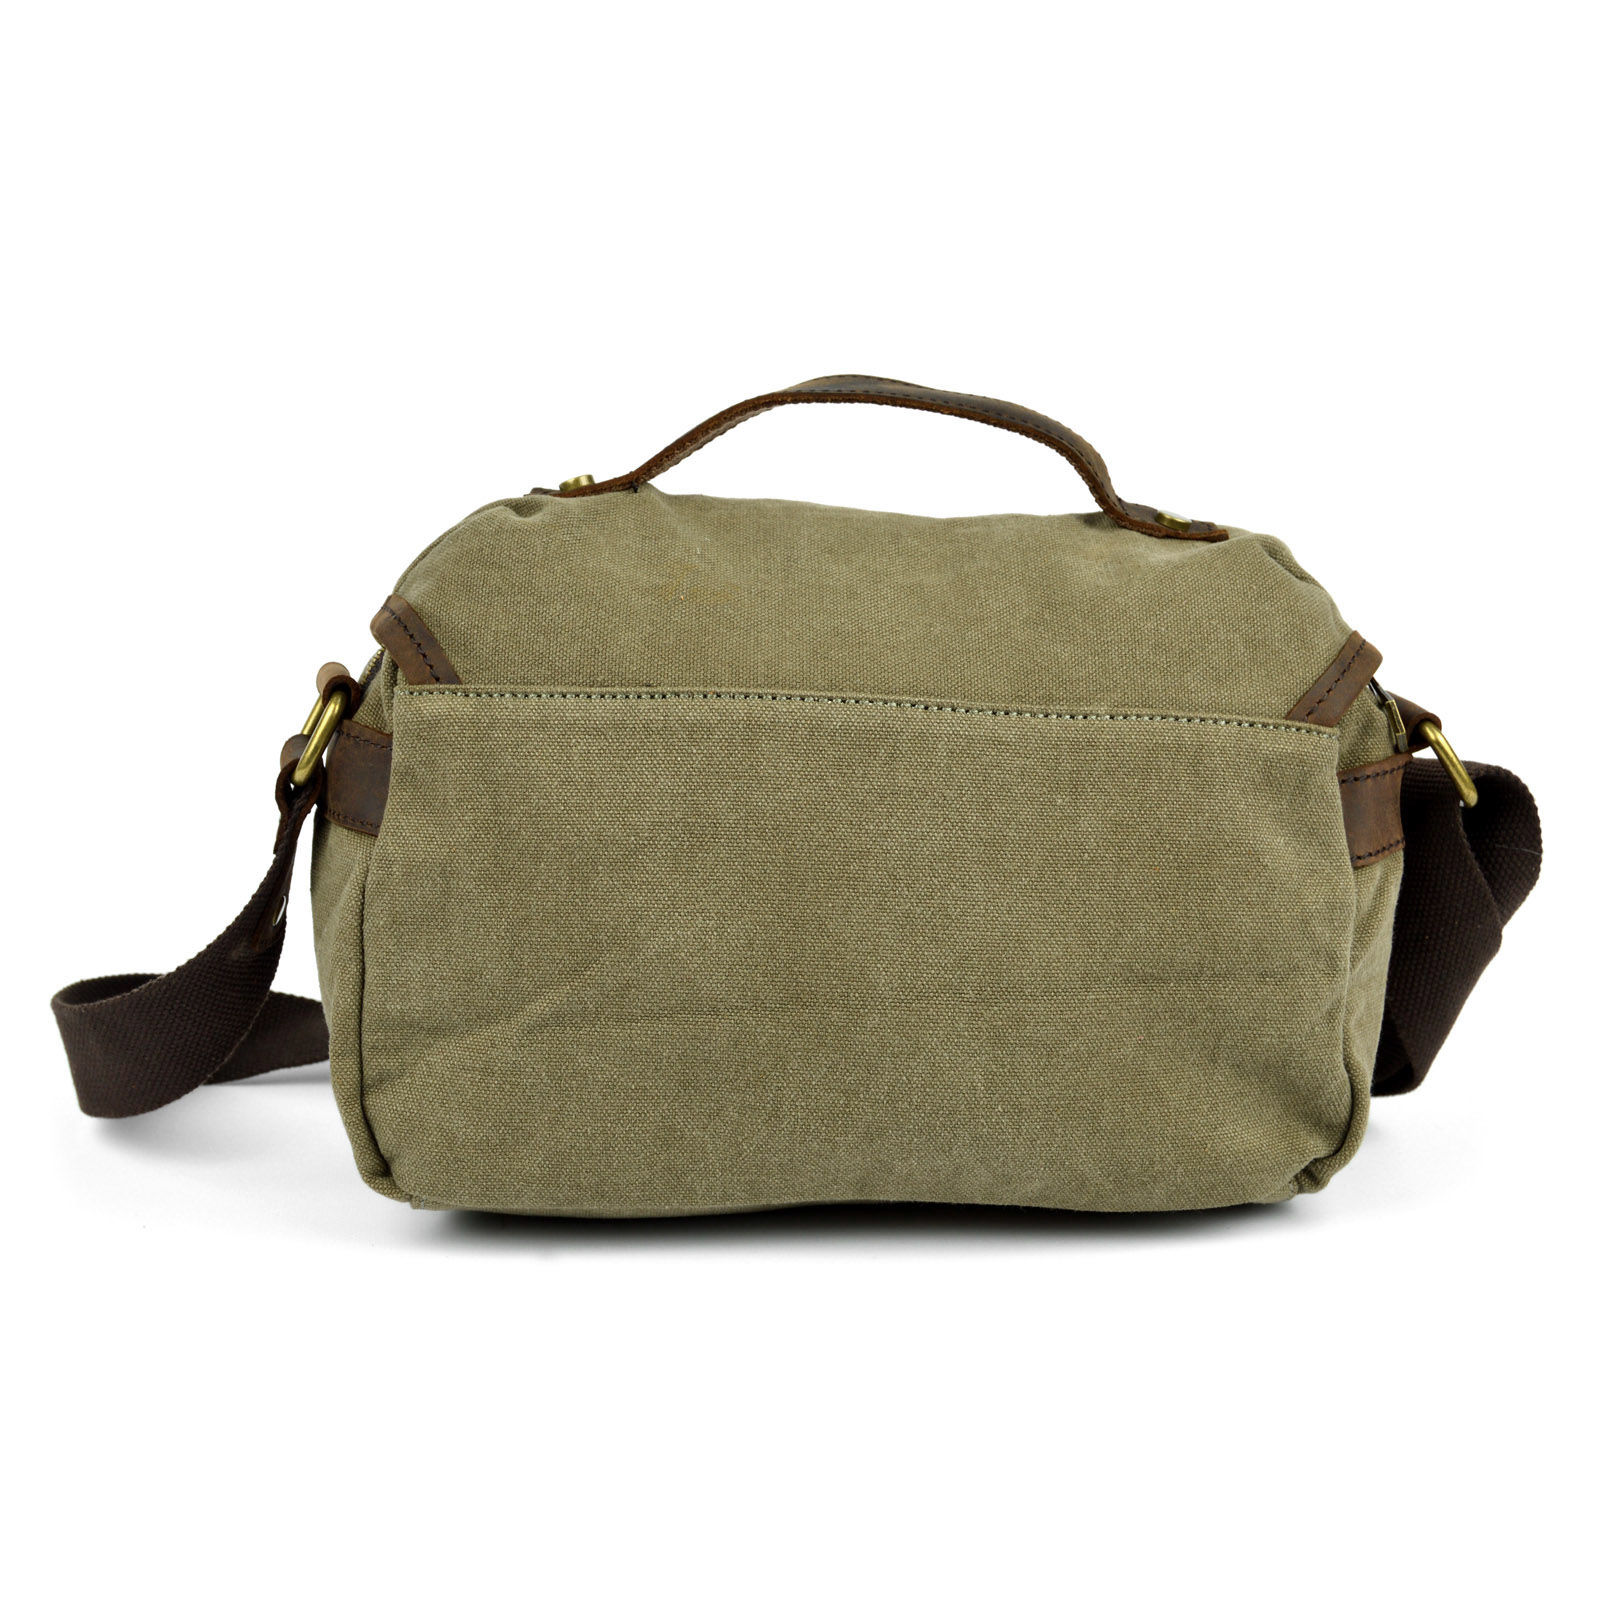 Ama Army Shoulder Bag Convey KowdaY